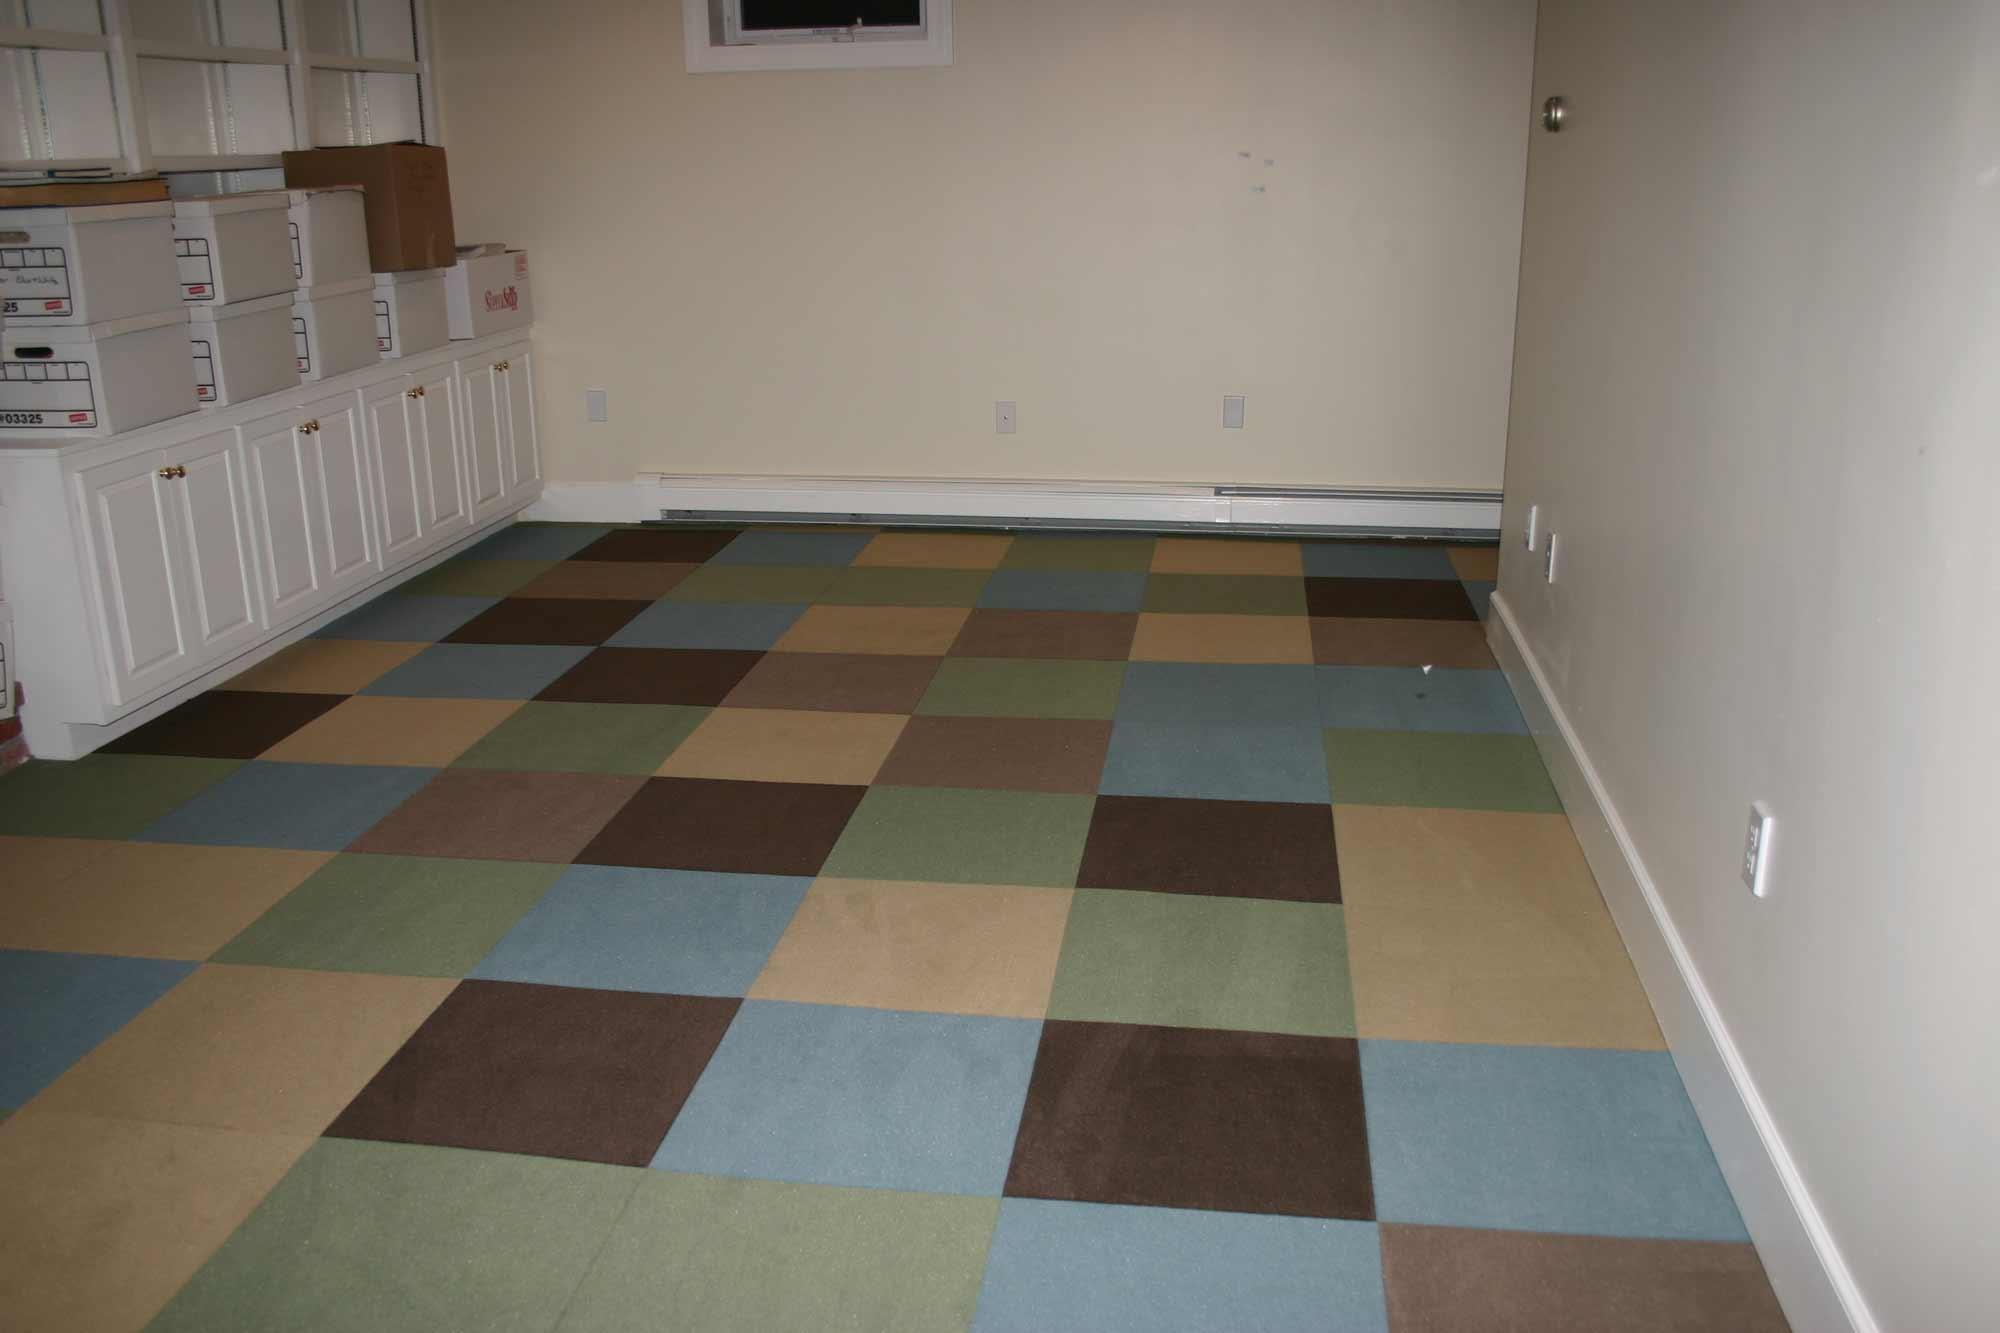 Rubber Basement Flooring Options